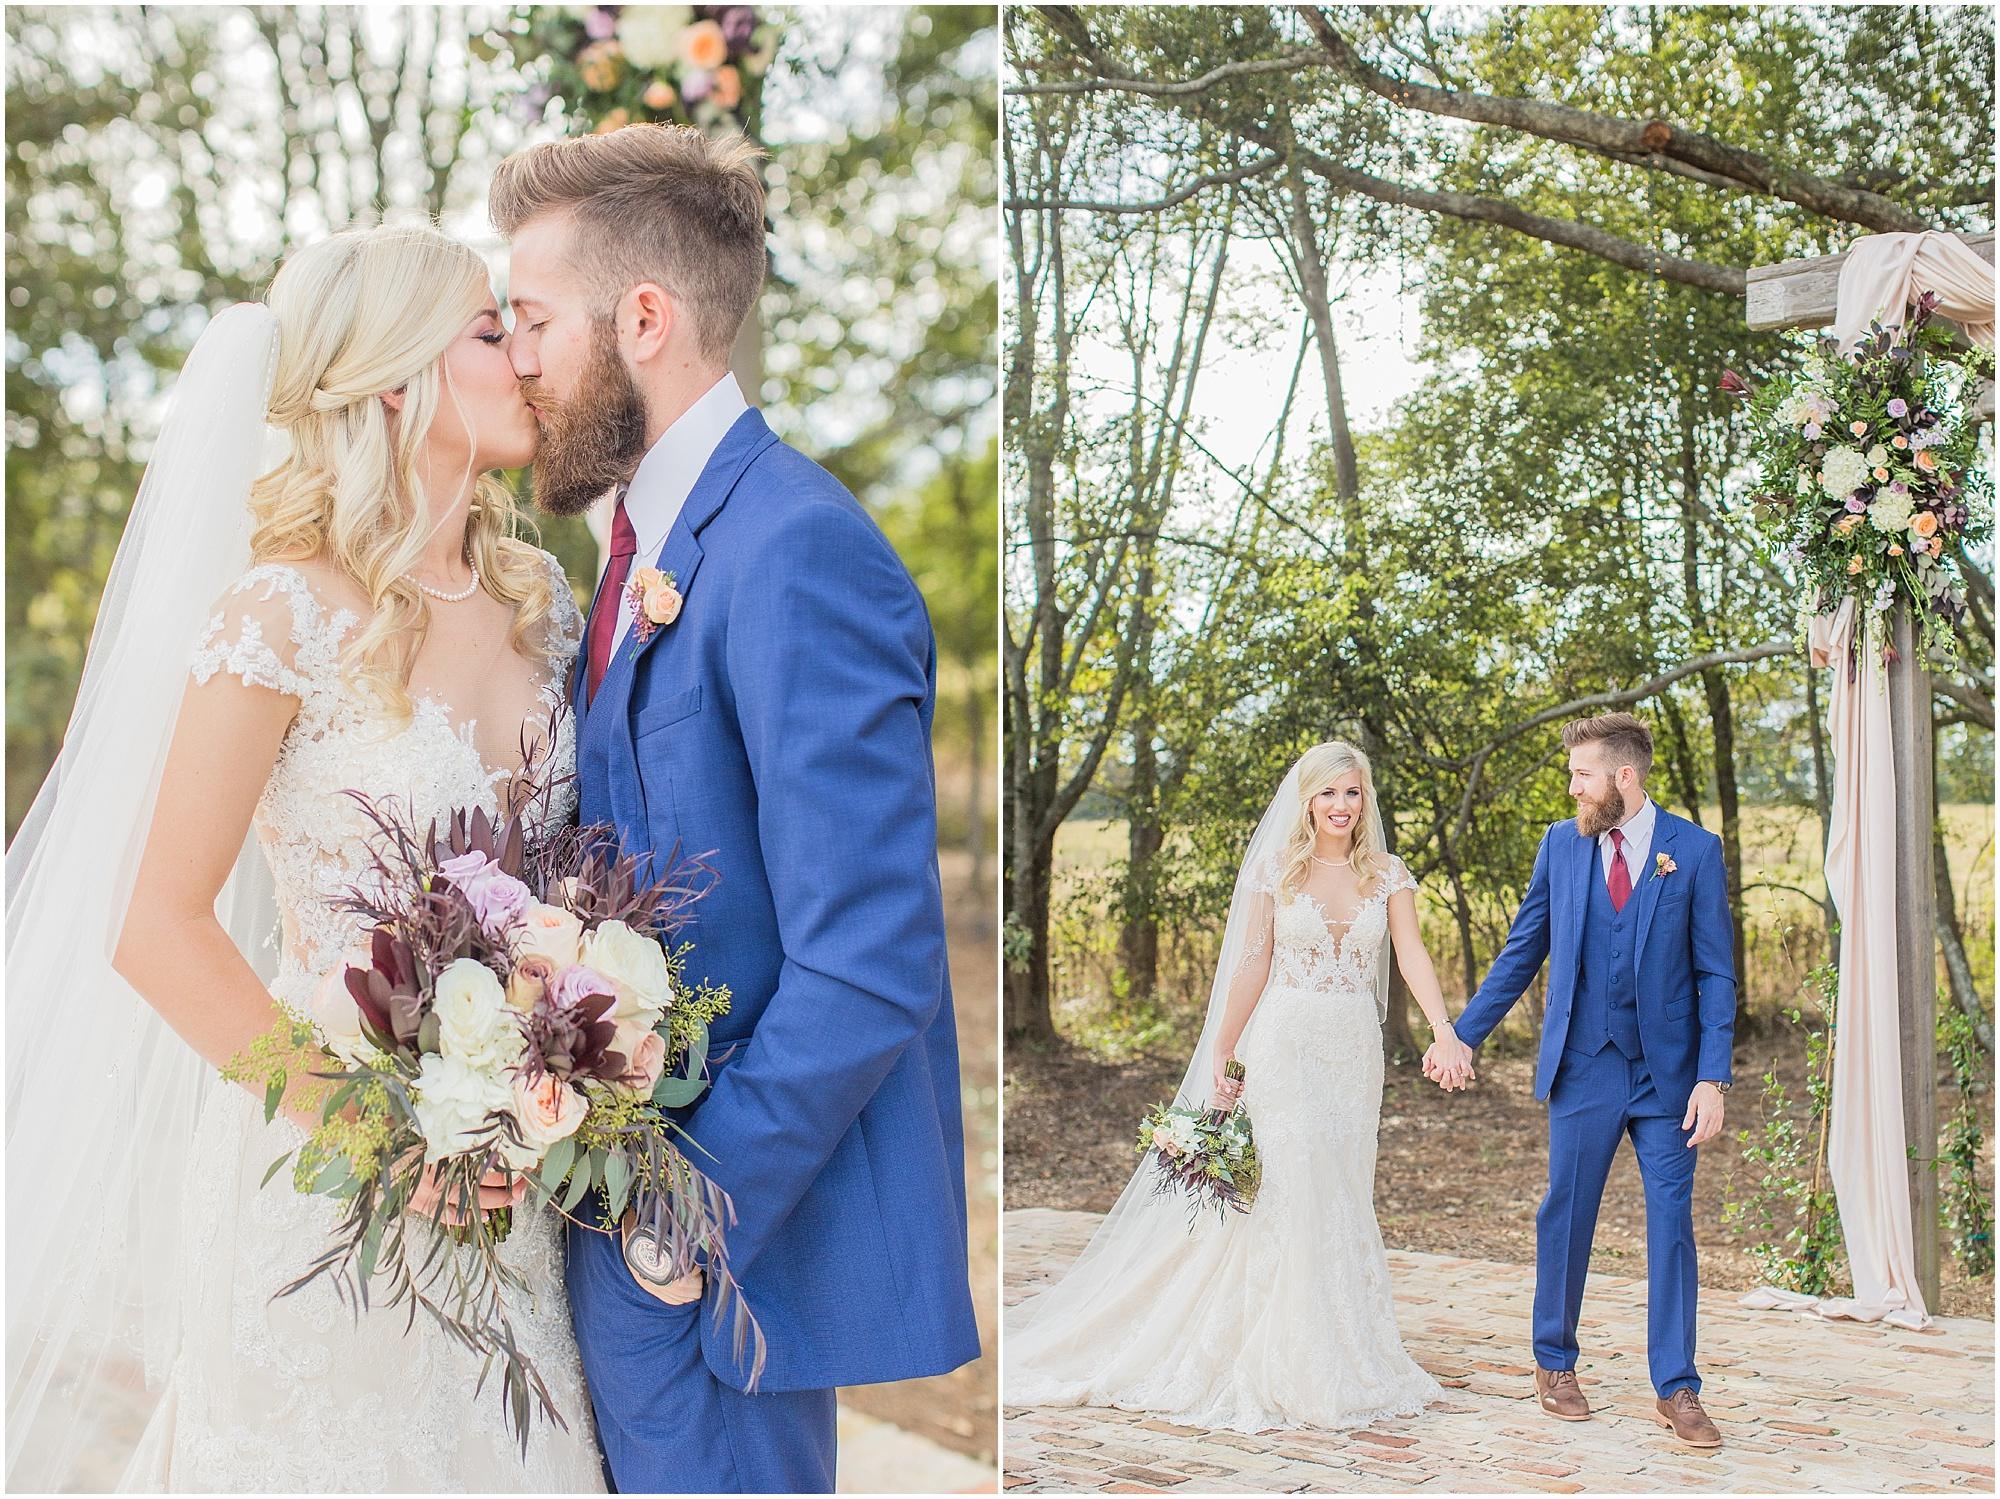 fall-wedding-bridlewood-of-madison-mississippi_0021.jpg